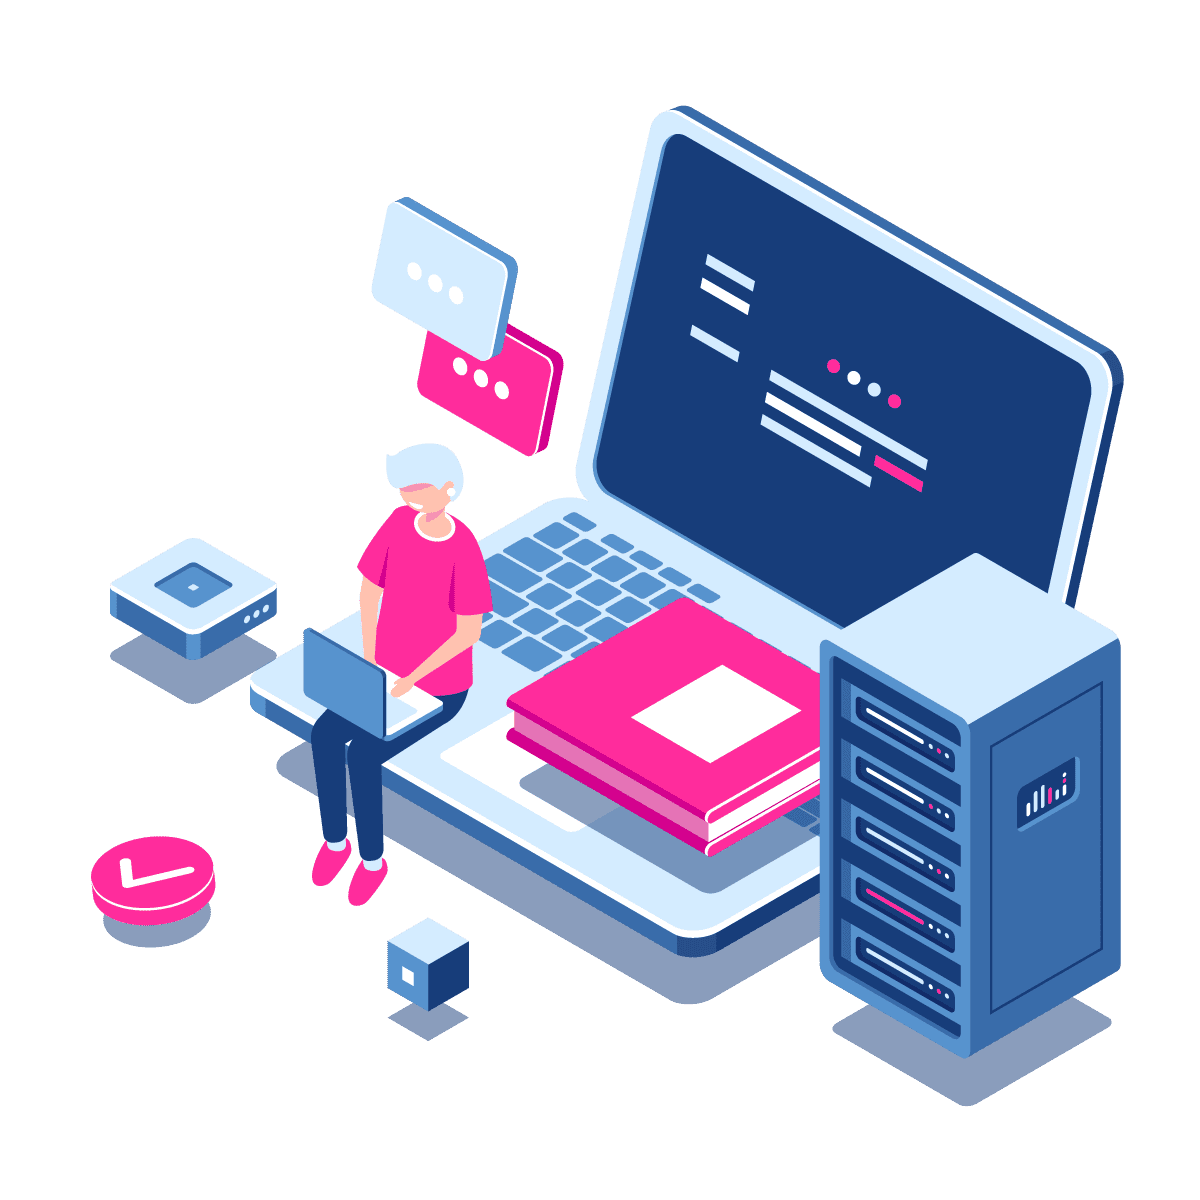 Web-Application-Icon-Transparent-PNG